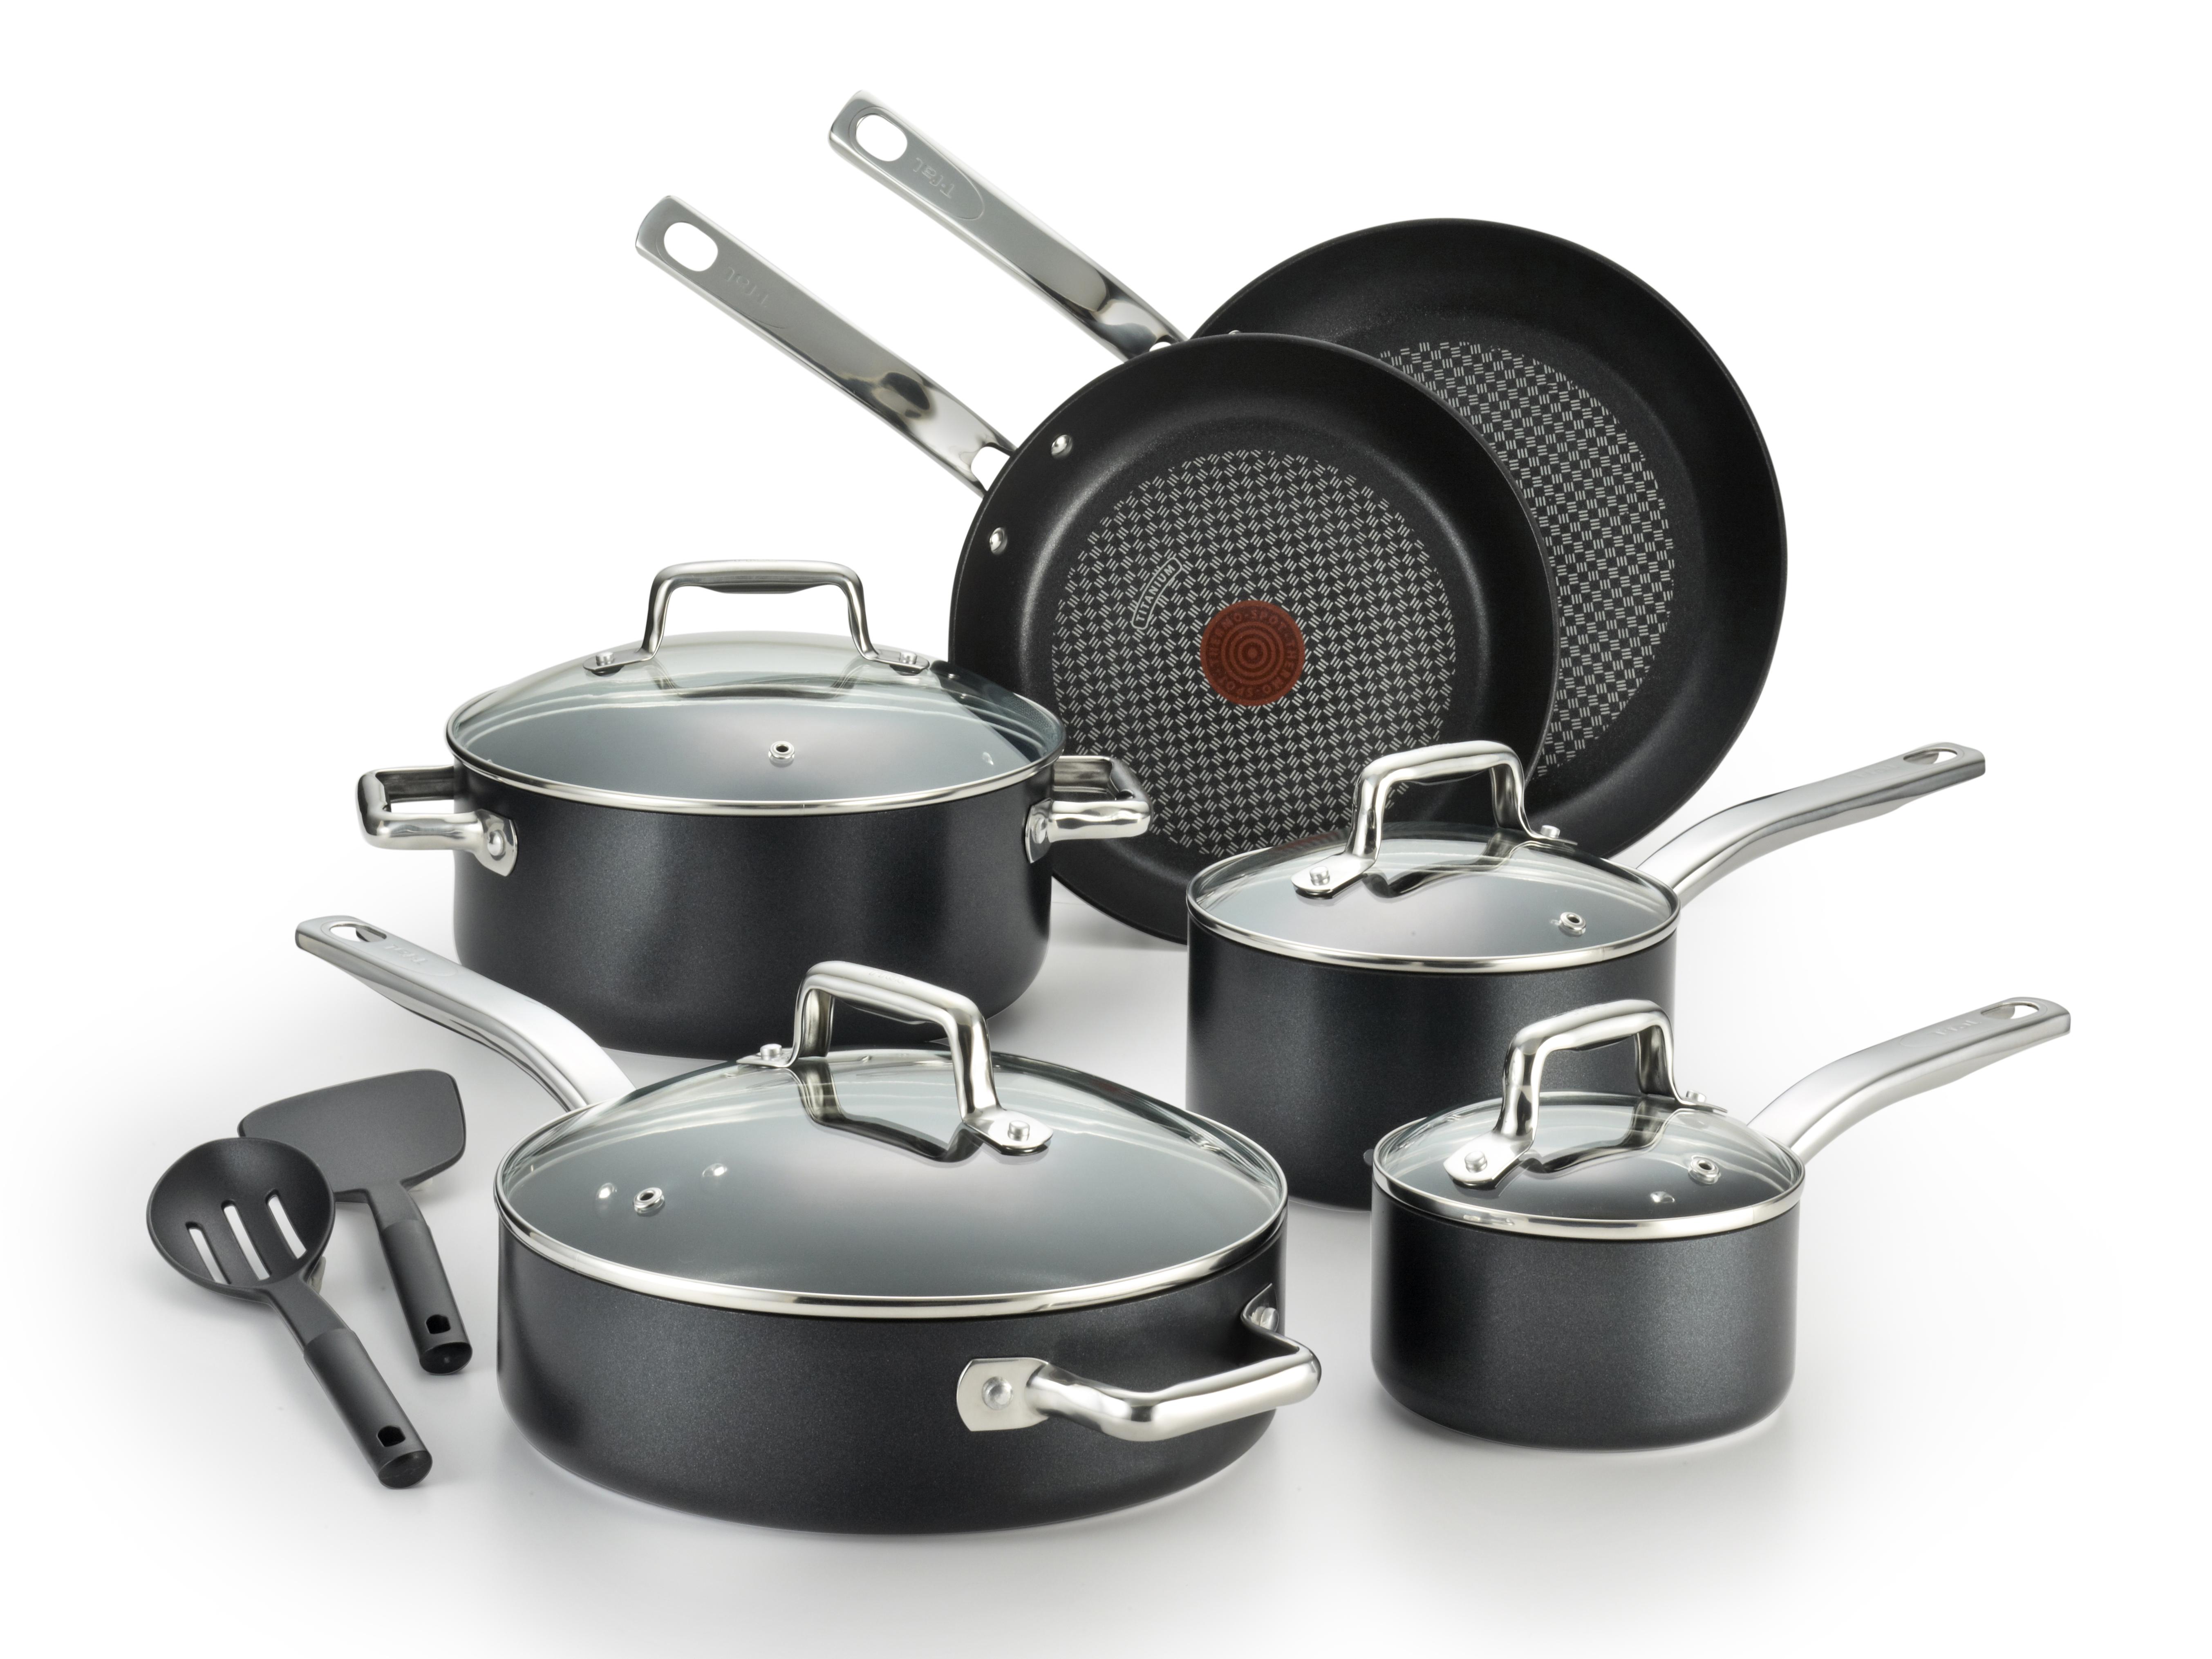 T Fal Pro Grade Titanium 12 Piece Non Stick Cookware Makes